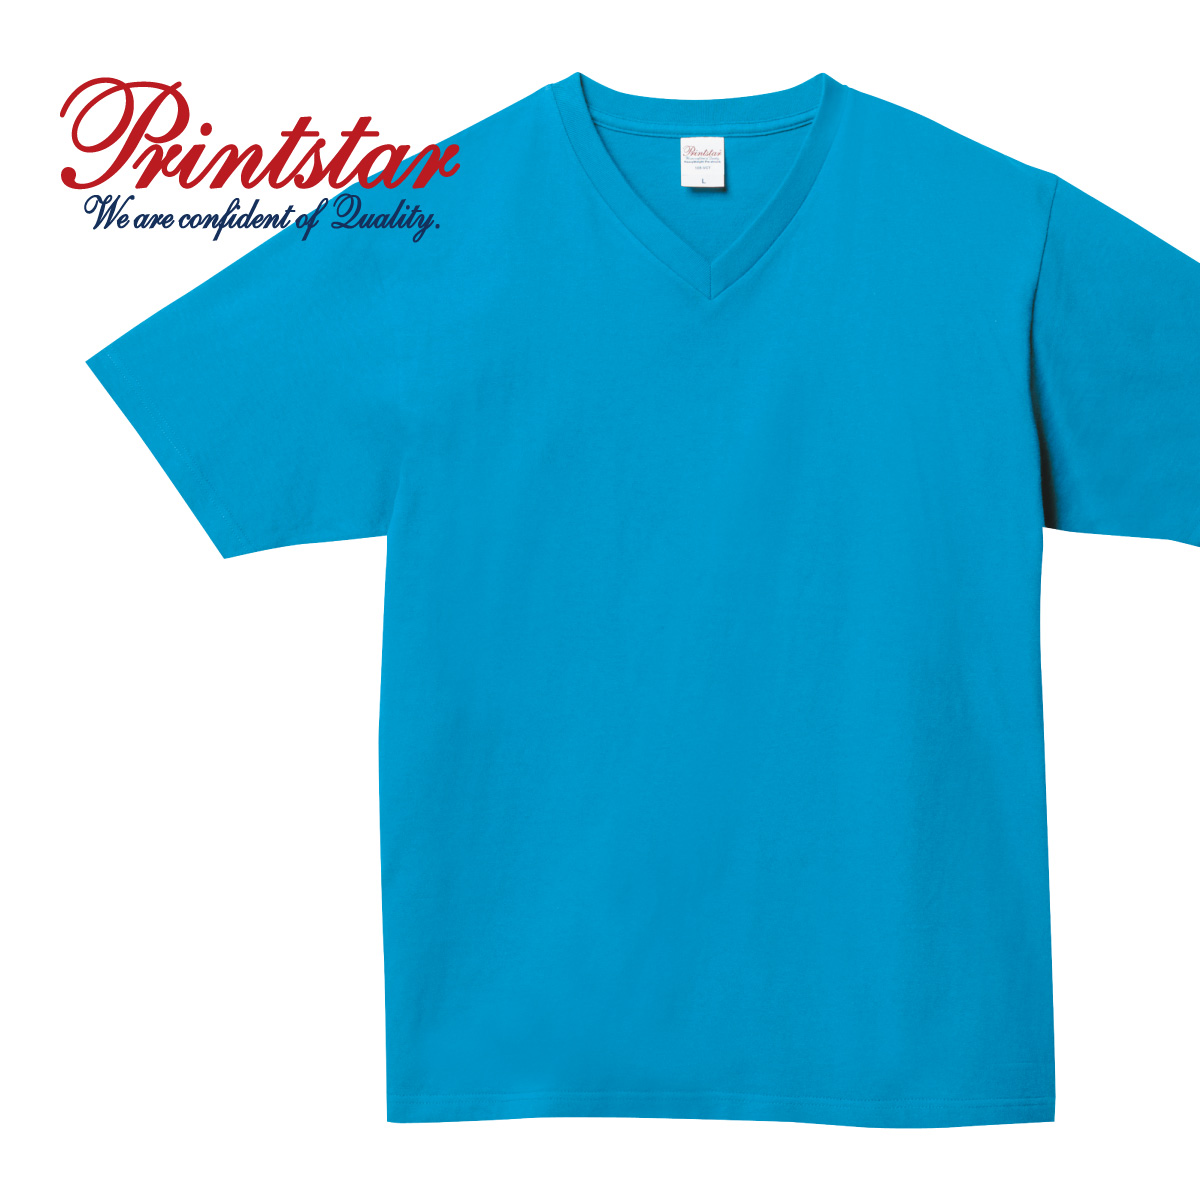 tシャツ メンズ 半袖 人気ブランド 厚手 Vネック 18%OFF 白 黒 など XS-XL 無地 Printstar 00108-VCT ヘビーウェイト プリントスター Tシャツ ユニフォーム 108vct 5.6オンス 通勤 インナー 通学